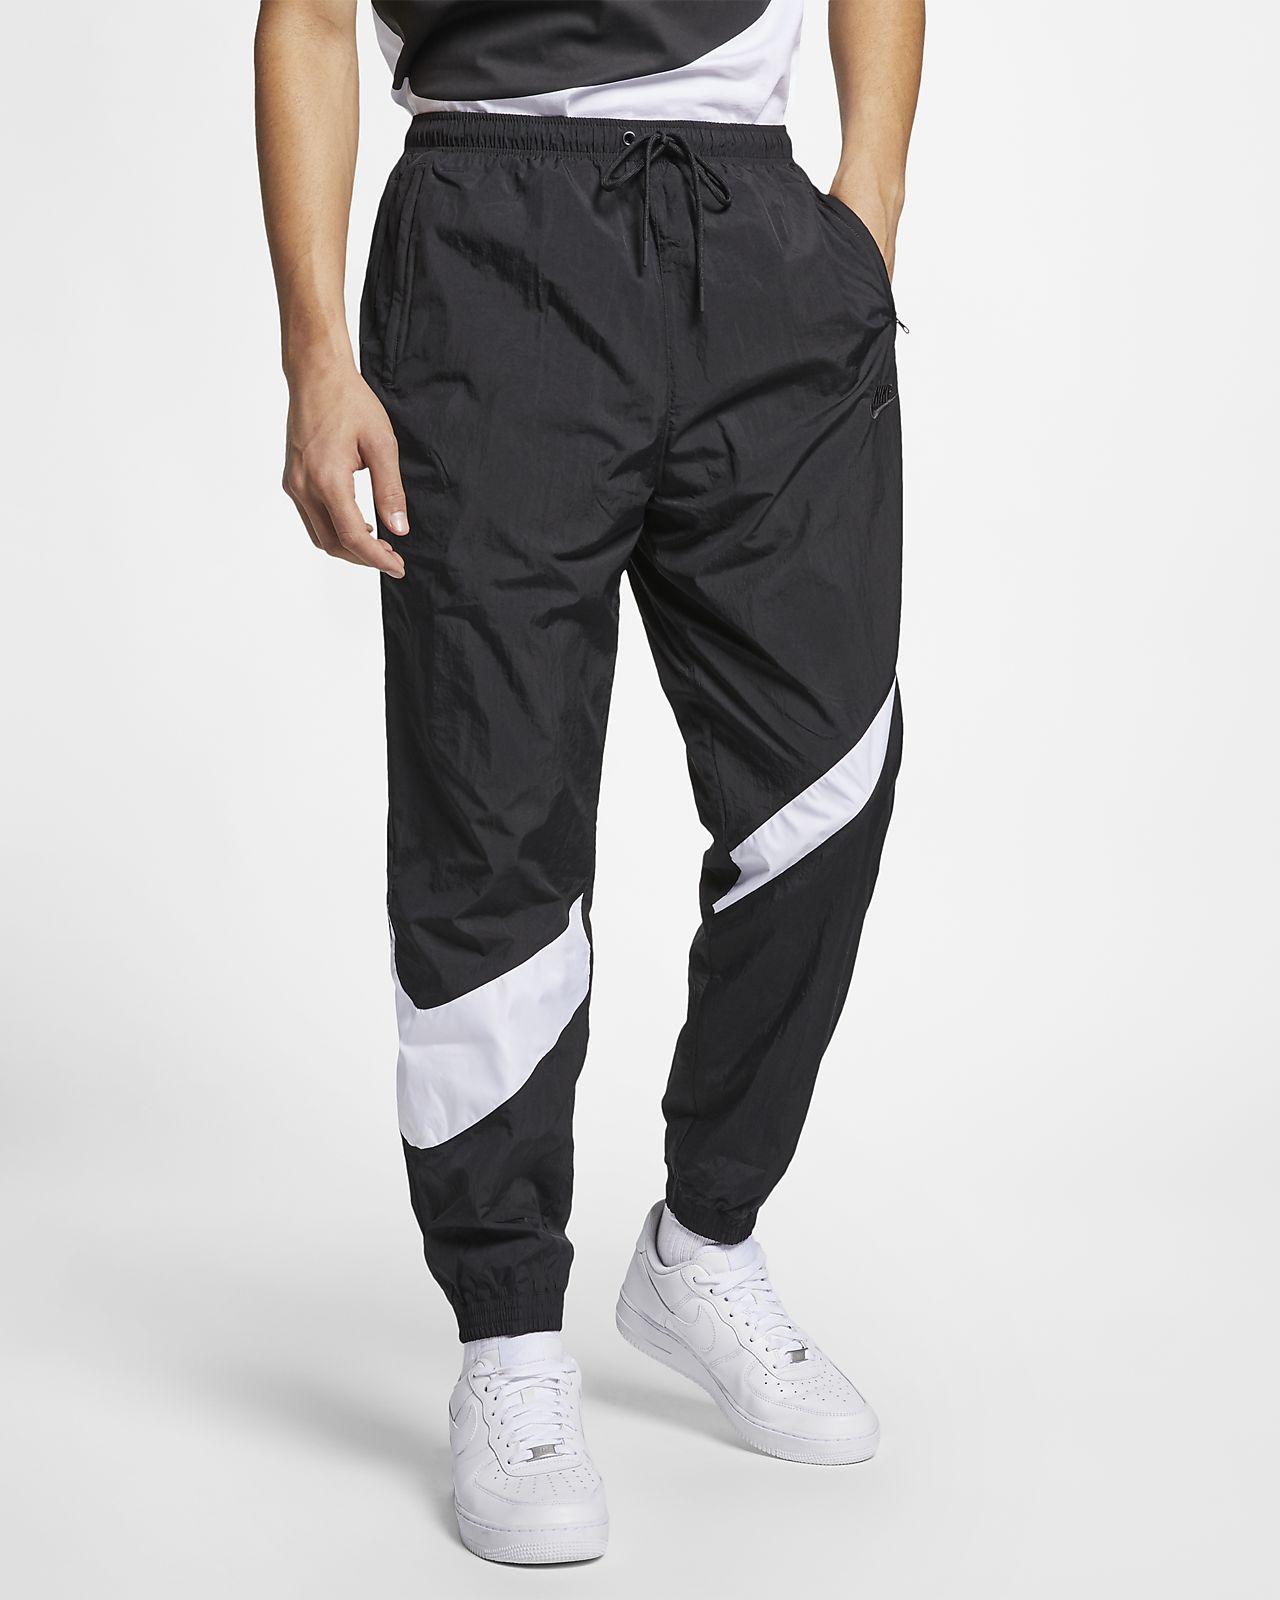 0cc0d0b333e2 Low Resolution Nike Sportswear Woven Trousers Nike Sportswear Woven Trousers